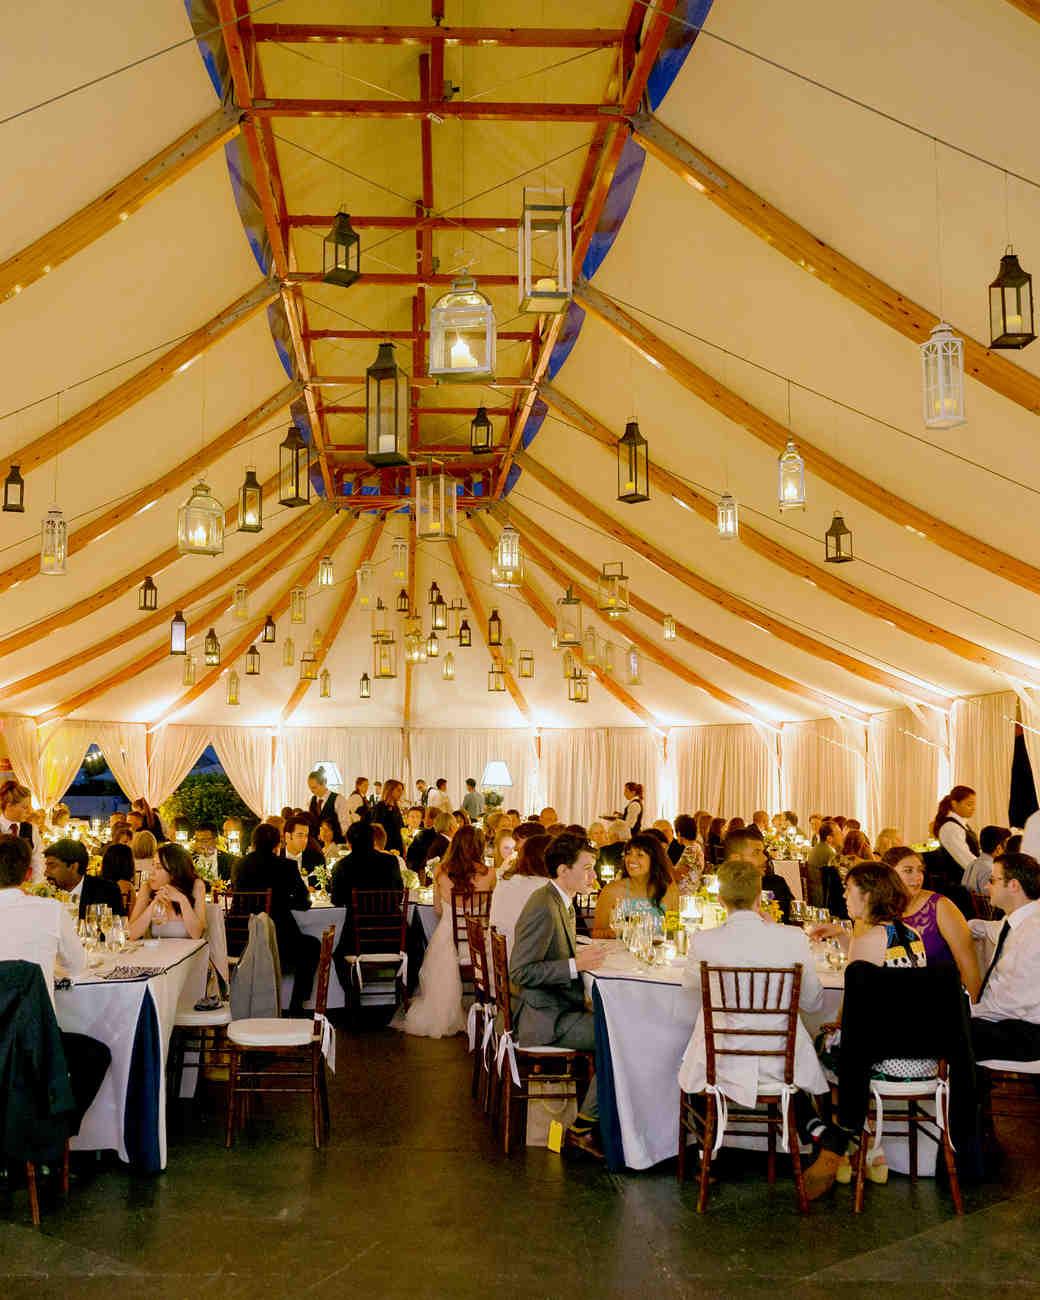 kristel-austin-wedding-dinner-1138-s11860-0415.jpg